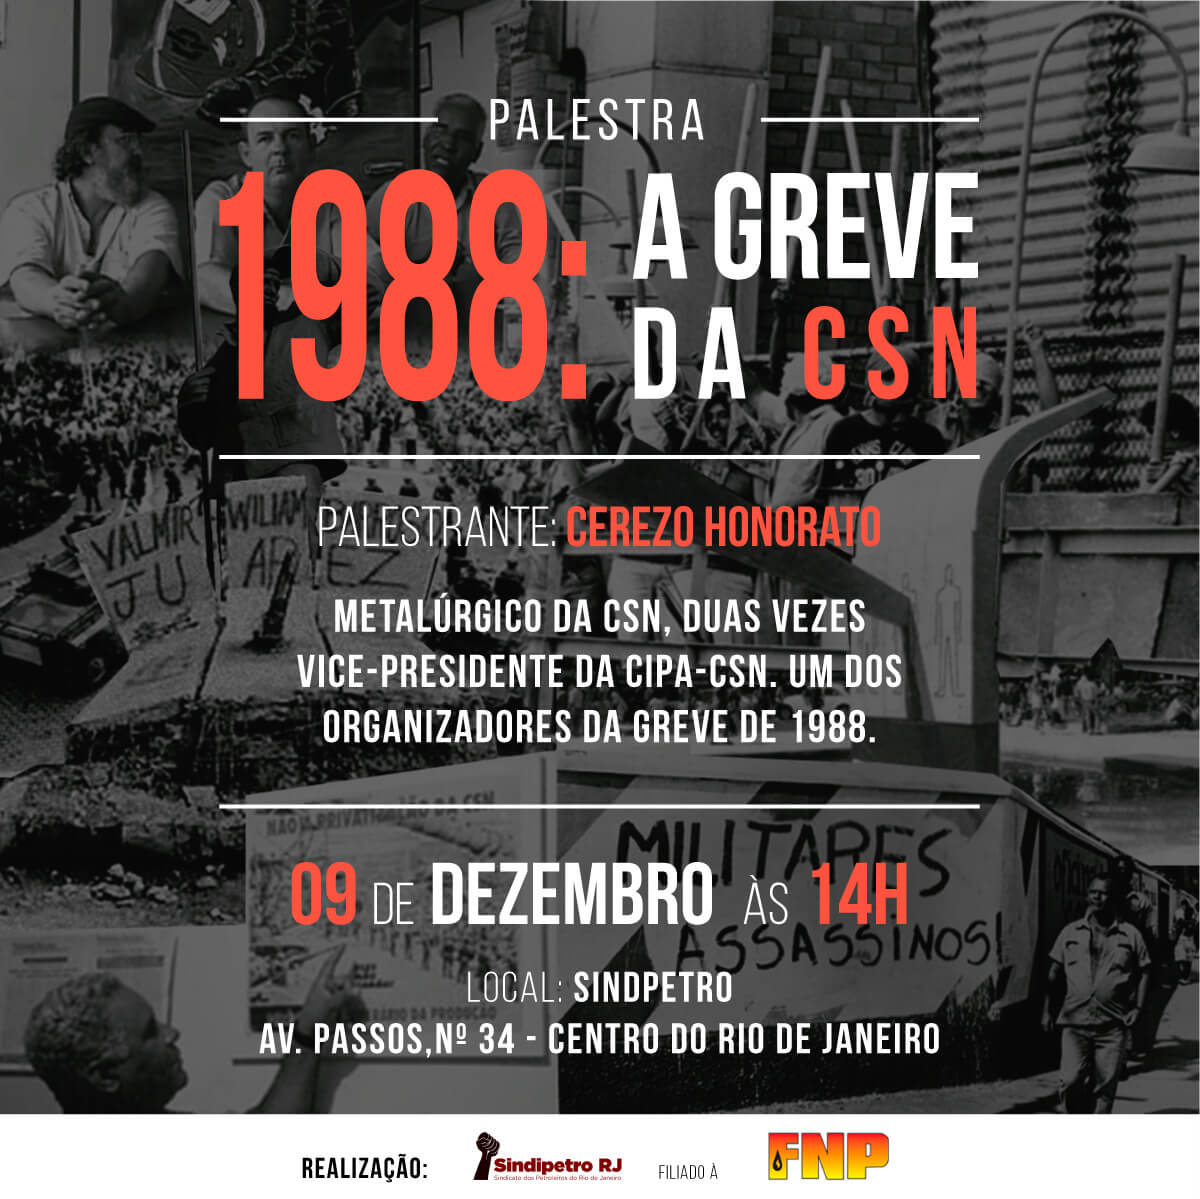 Palestra: 1988, a greve na CSN 19888  Palestra: 1988, a greve na CSN 19888